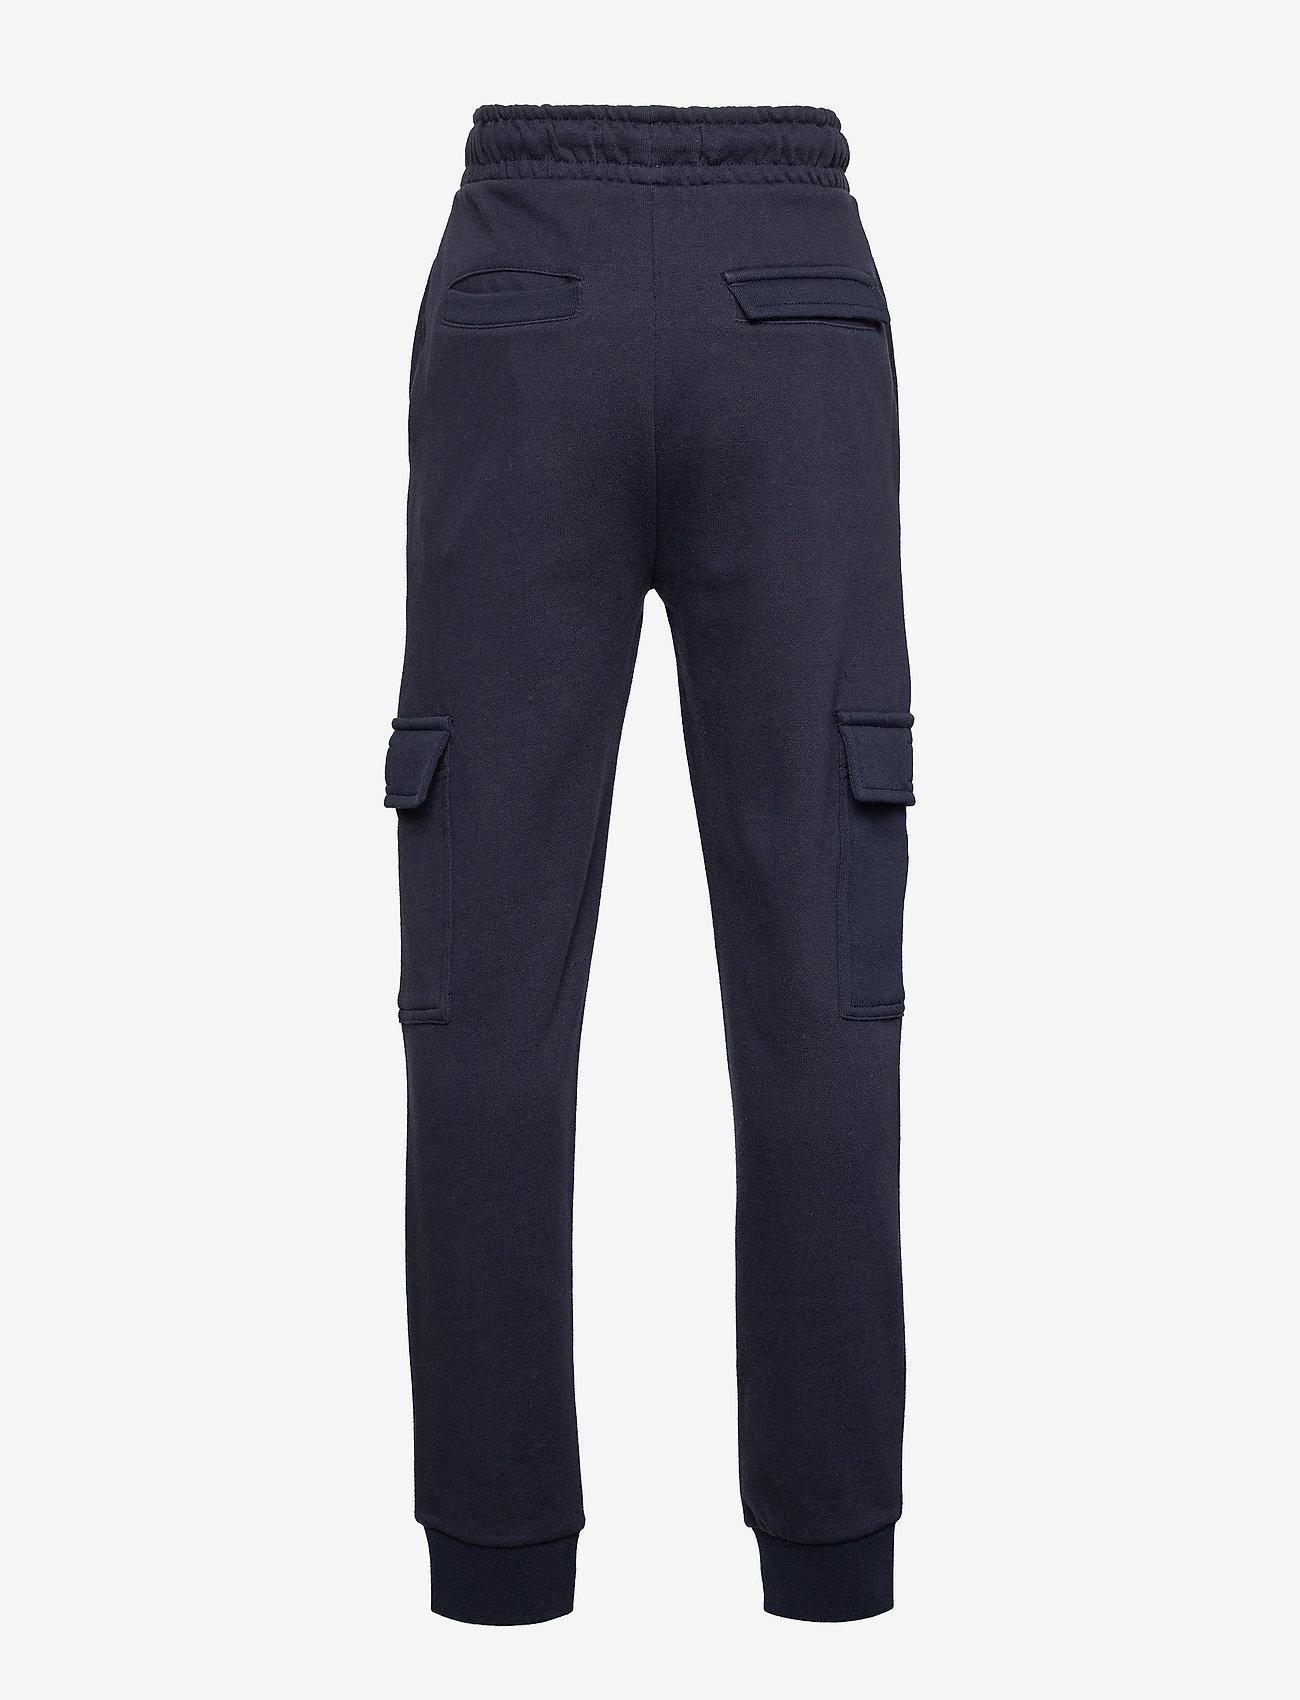 Lyle & Scott Junior - Cargo Jogger Navy Blazer - sweatpants - navy blazer - 1